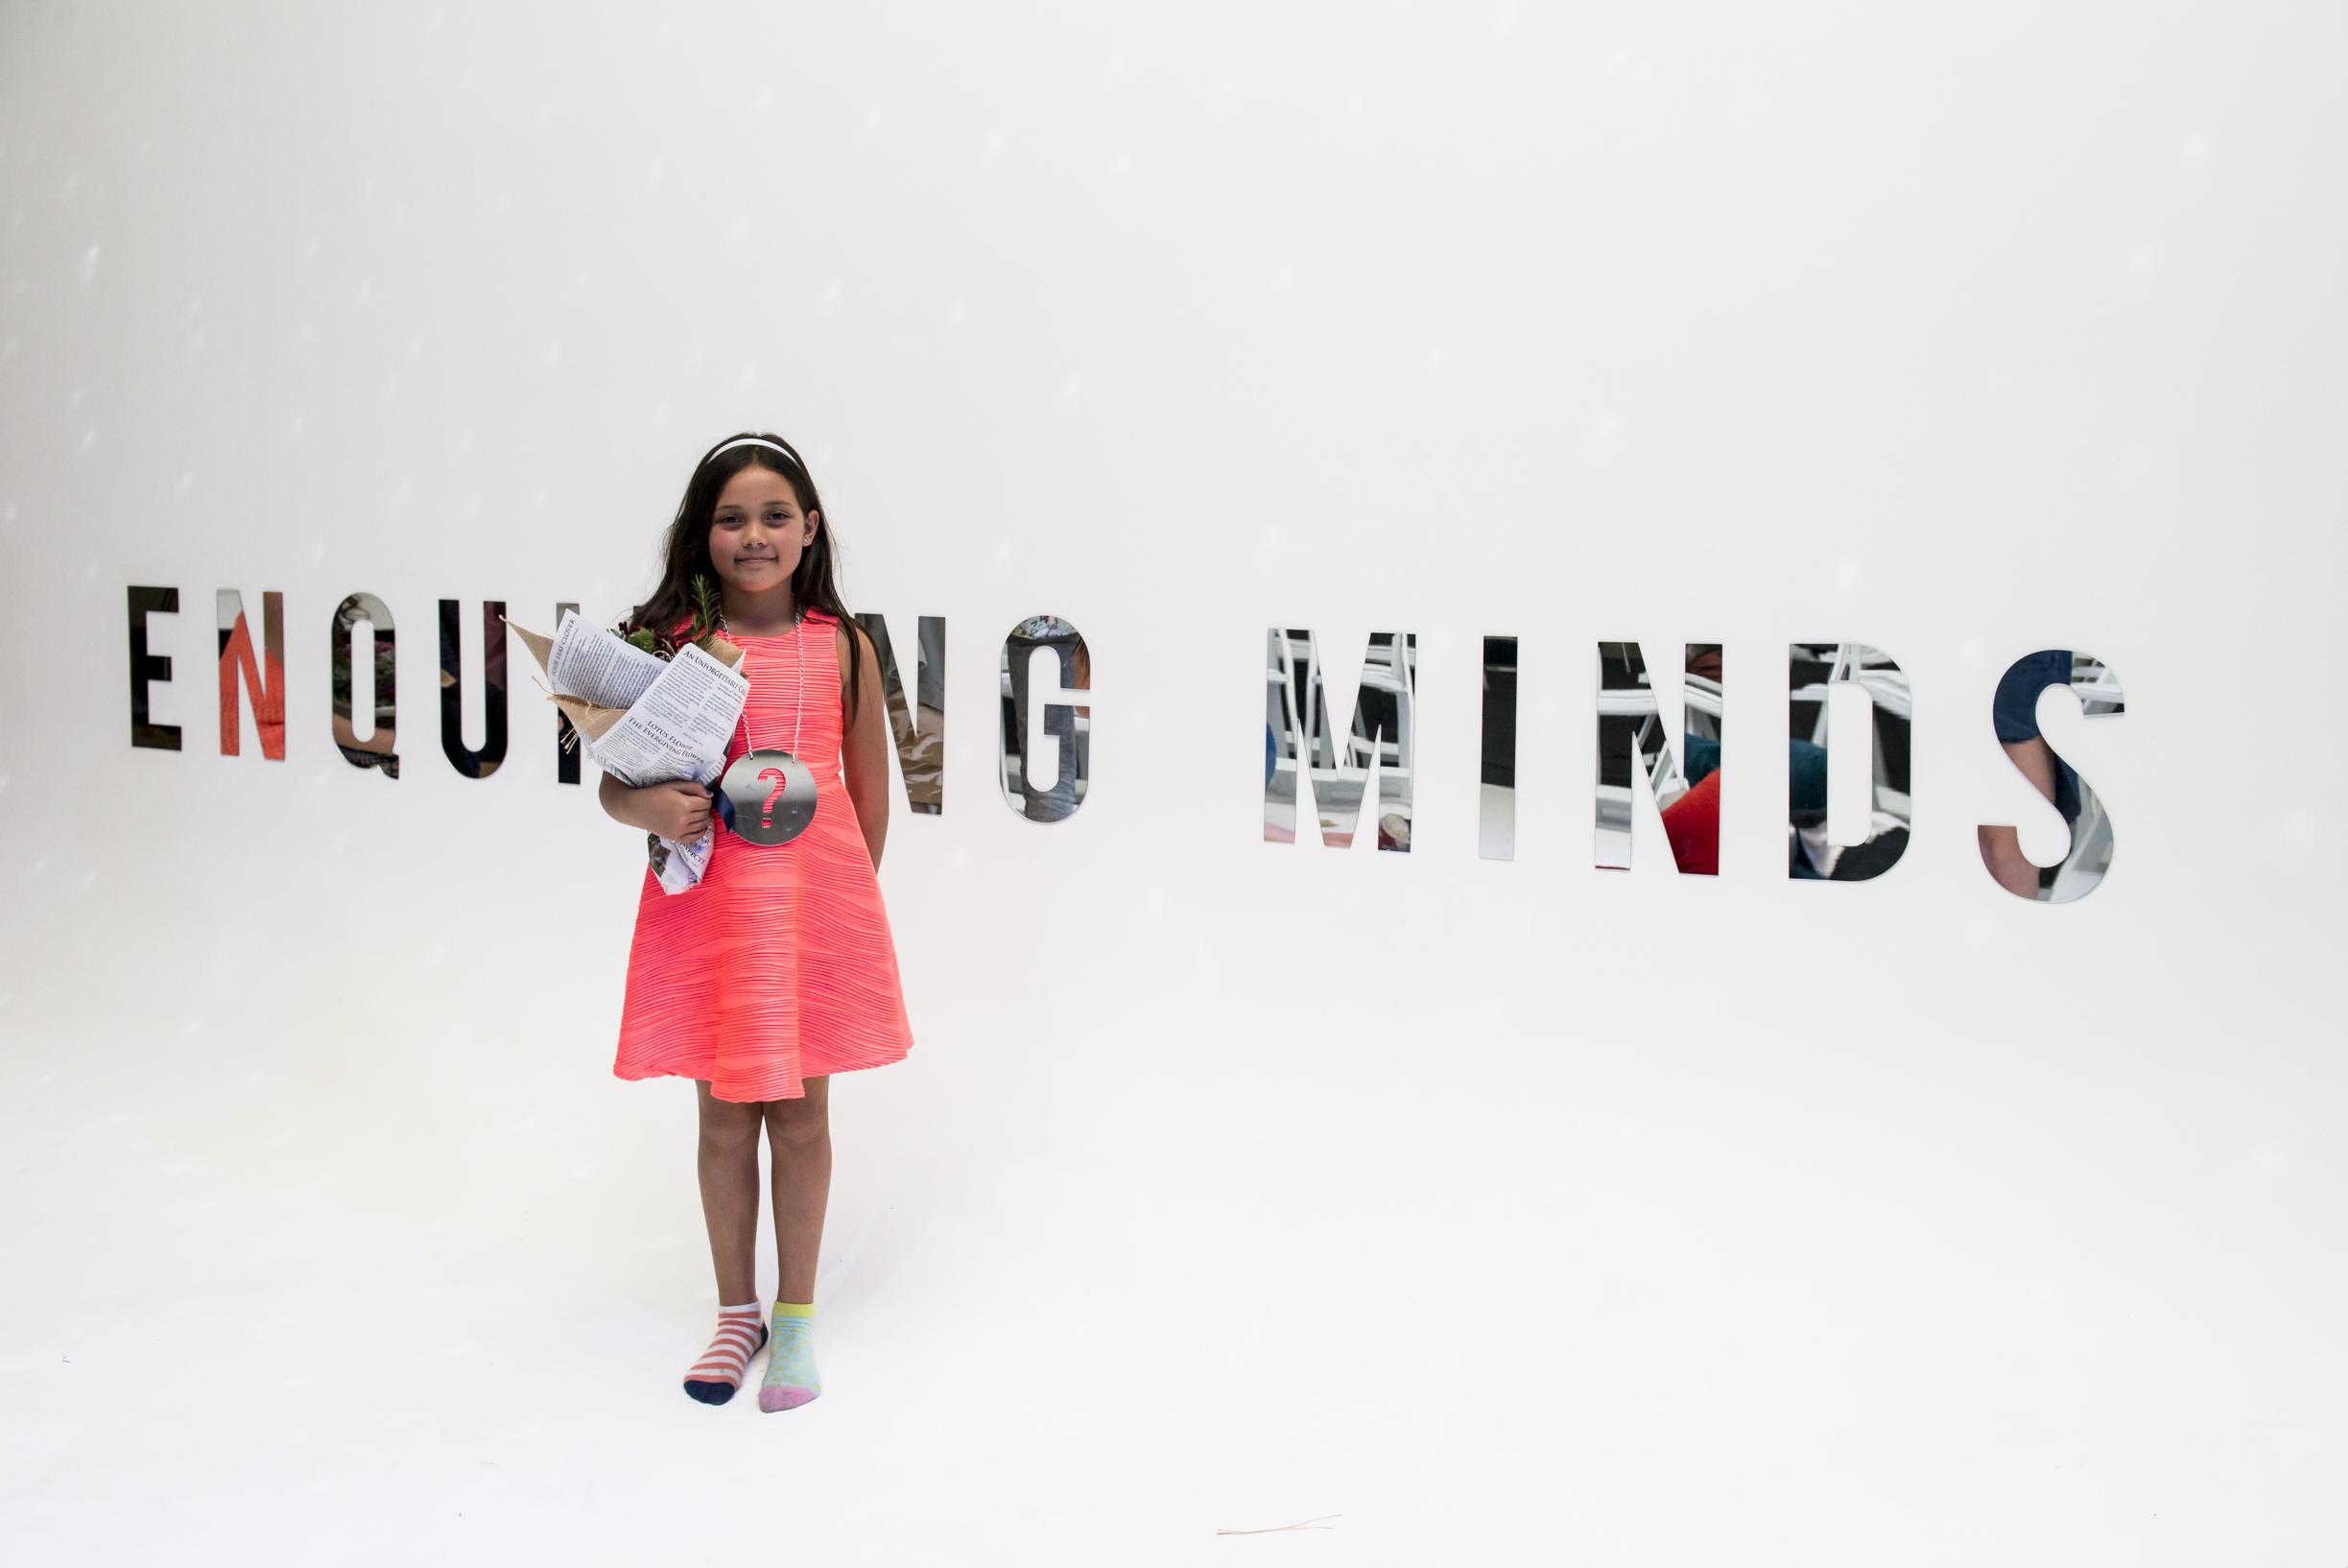 Enquiring Minds_288.jpg